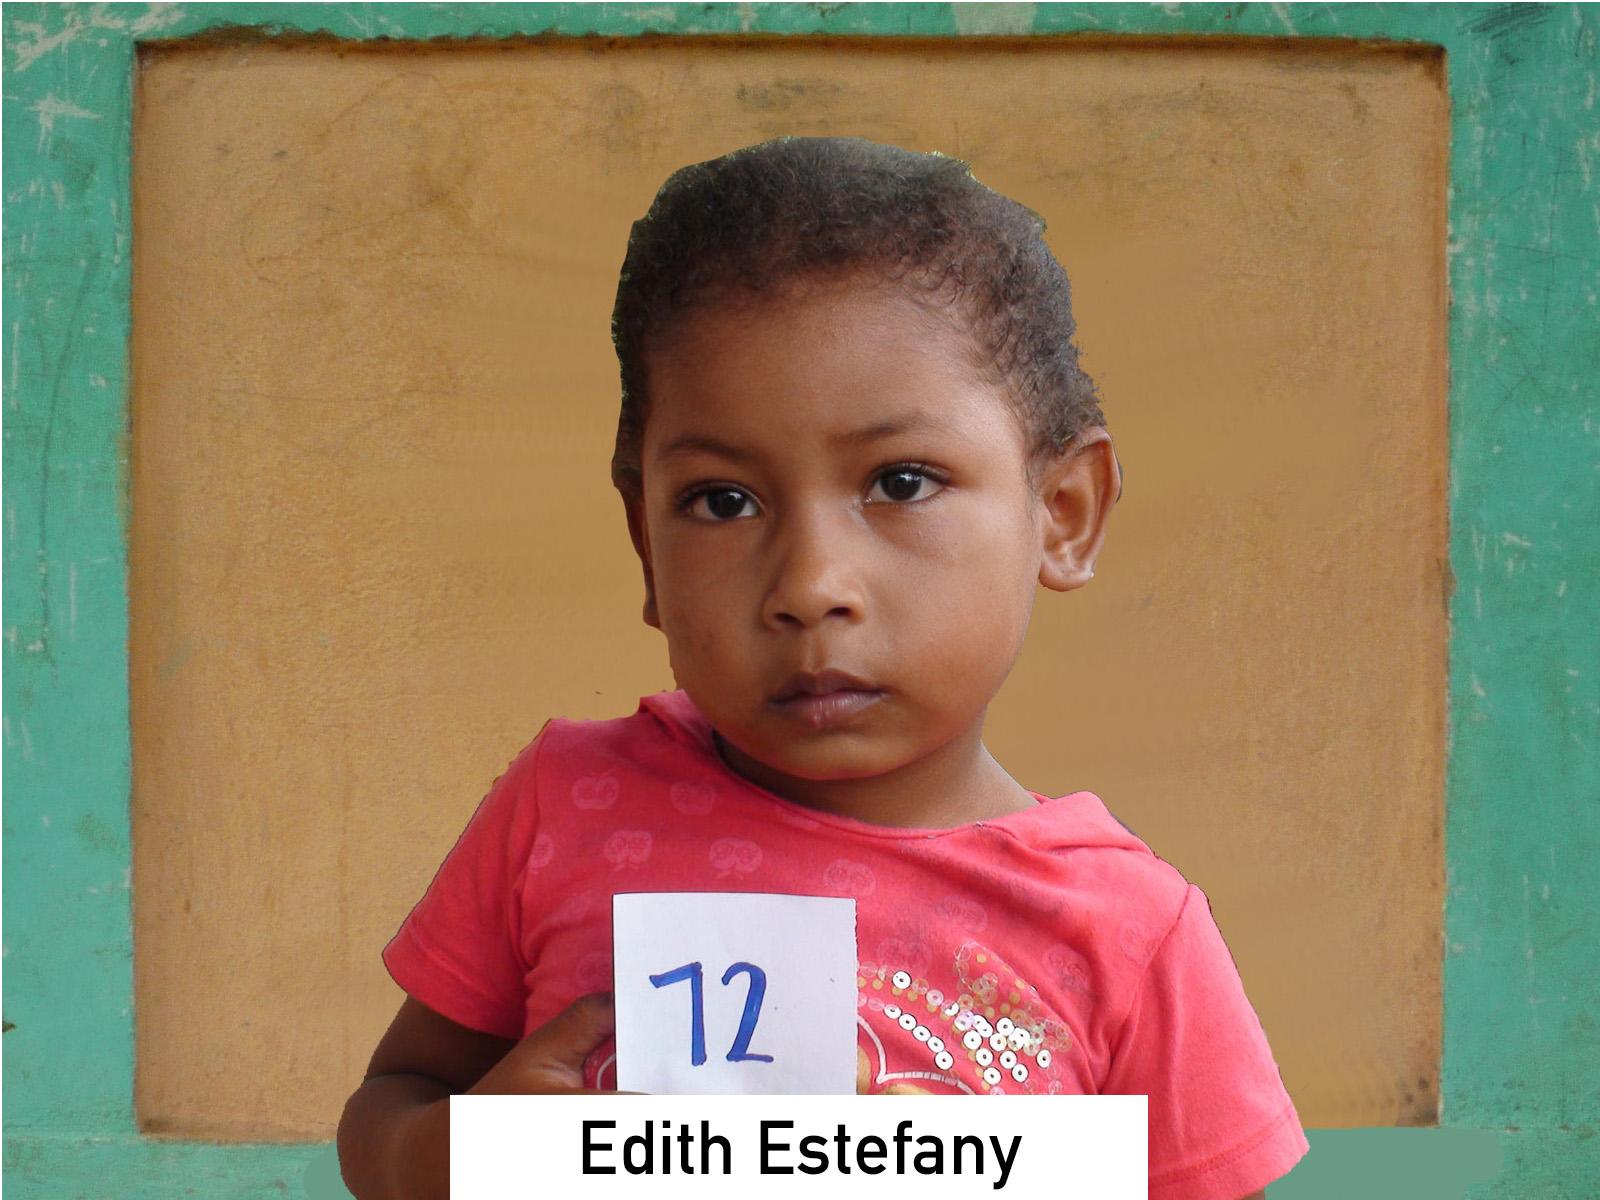 072 - Edith Estefany.jpg